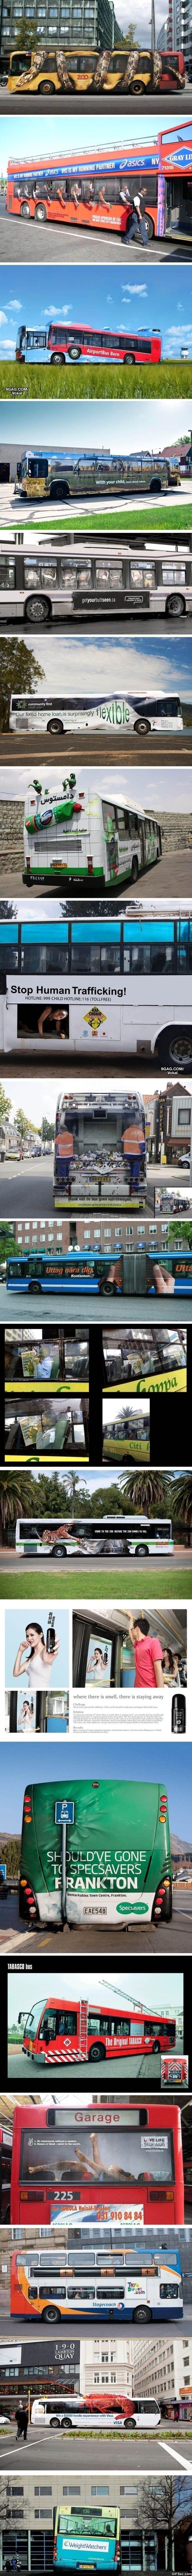 epic-bus-ads